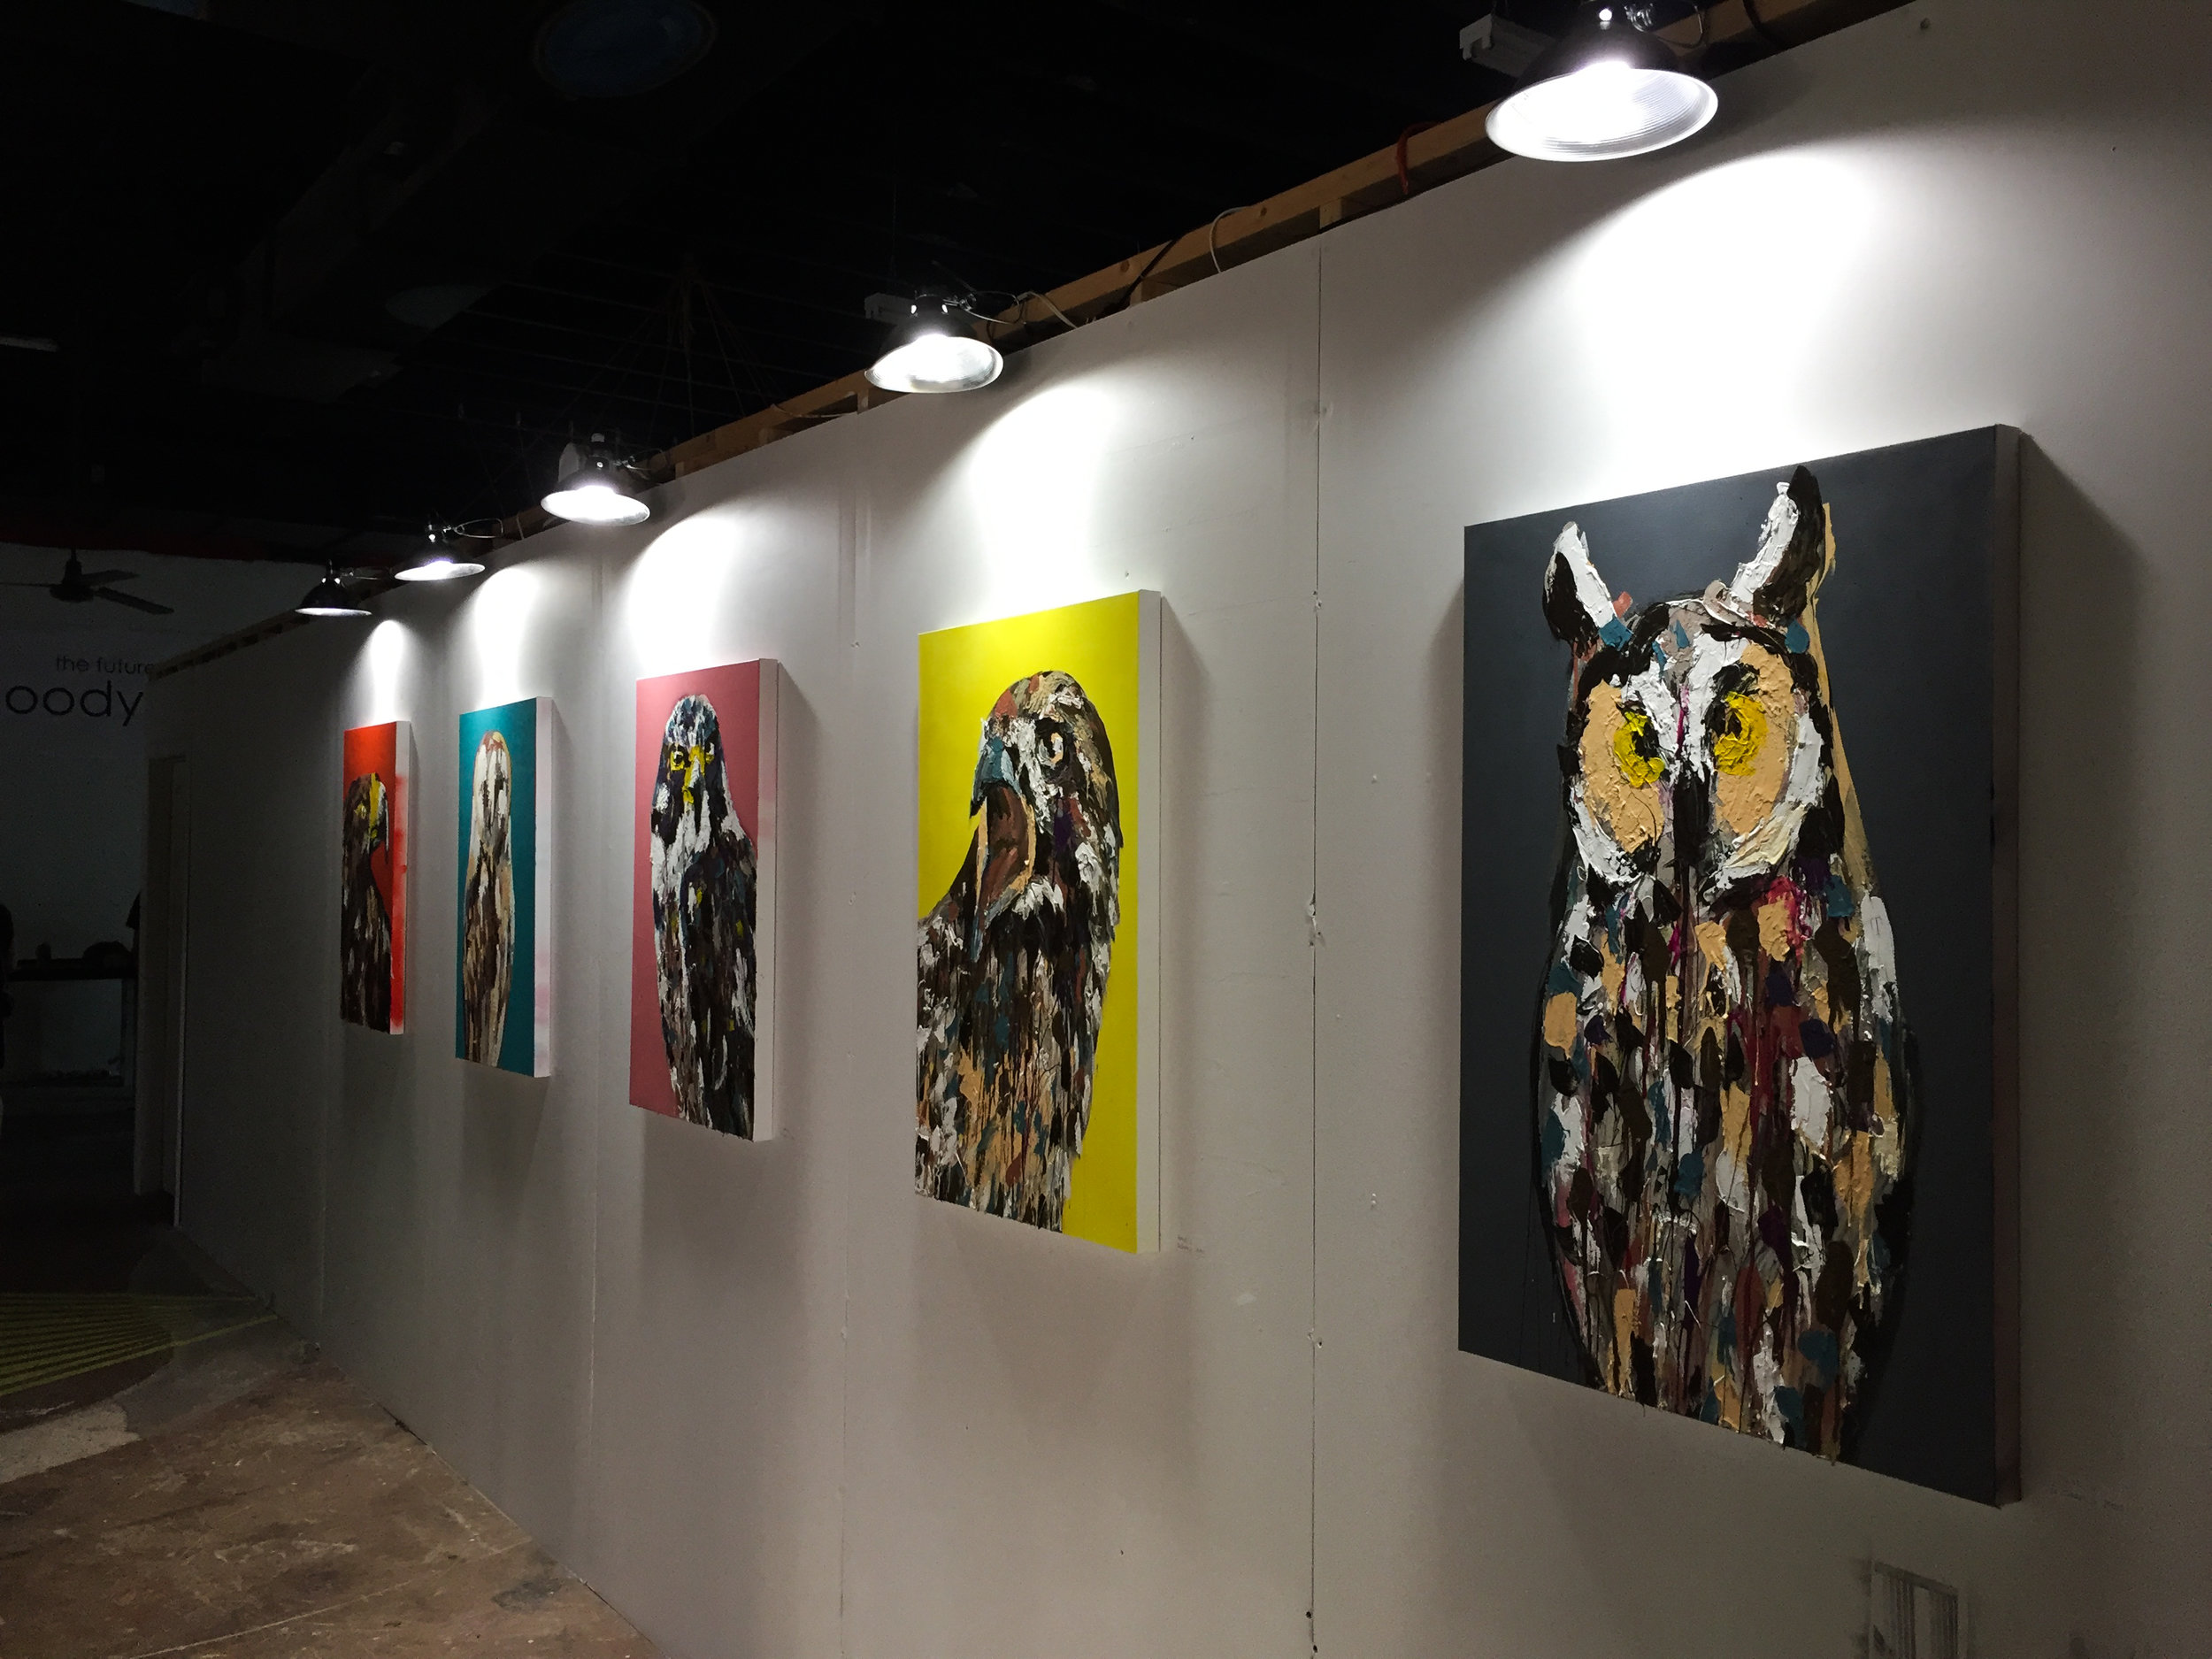 goodyear-arts-charlotte-nc-college-street-owls-birds